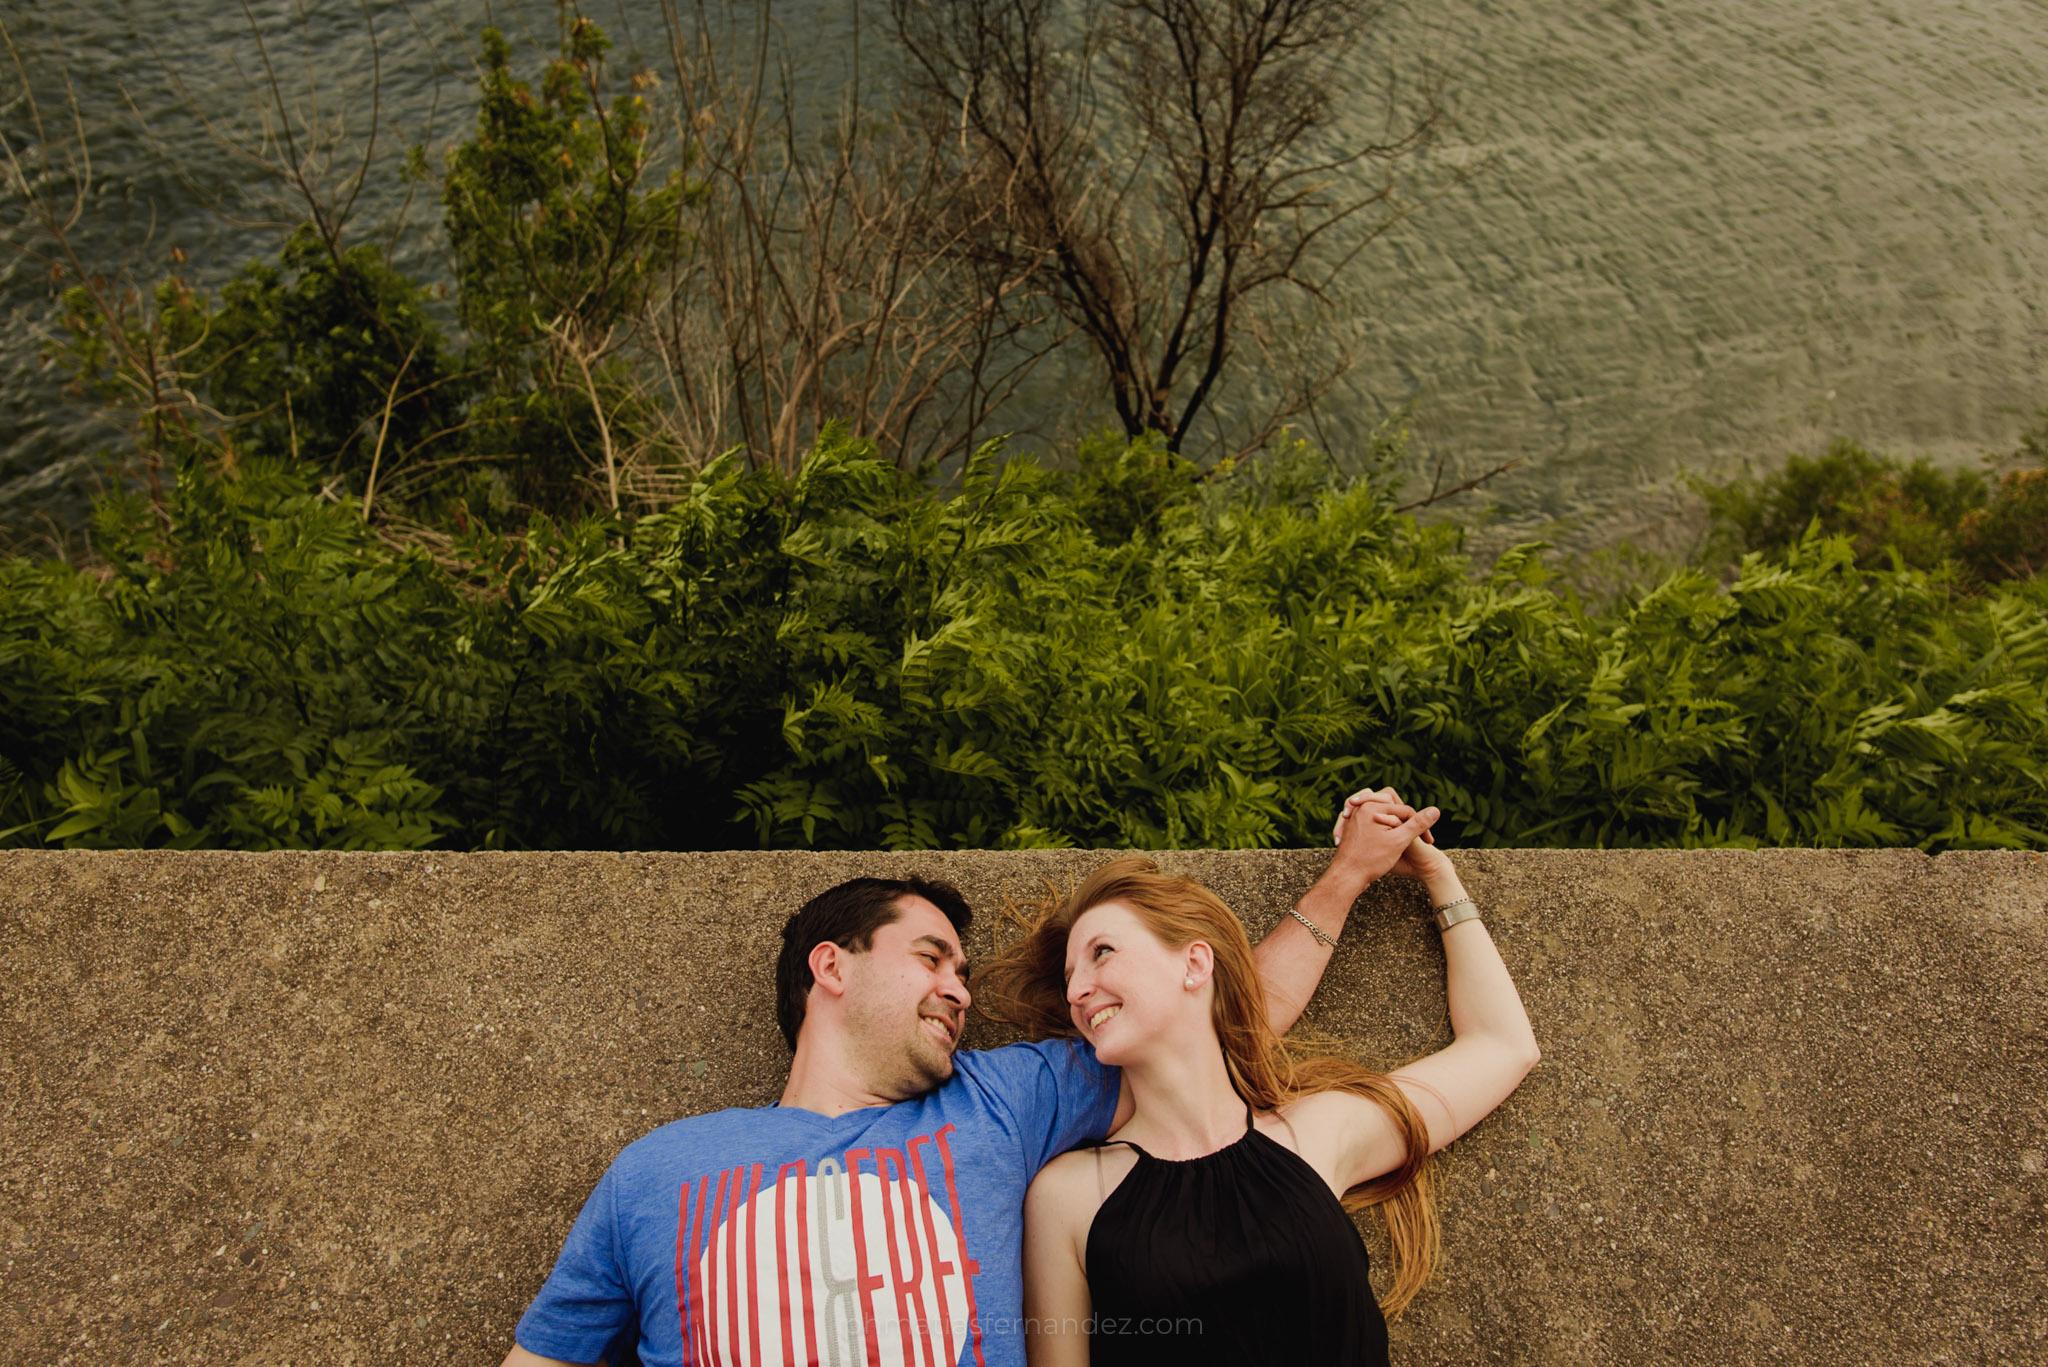 Aye & Claudio - phmatiasfernandez - matias fernandez - matias fernandez fotografo de bodas